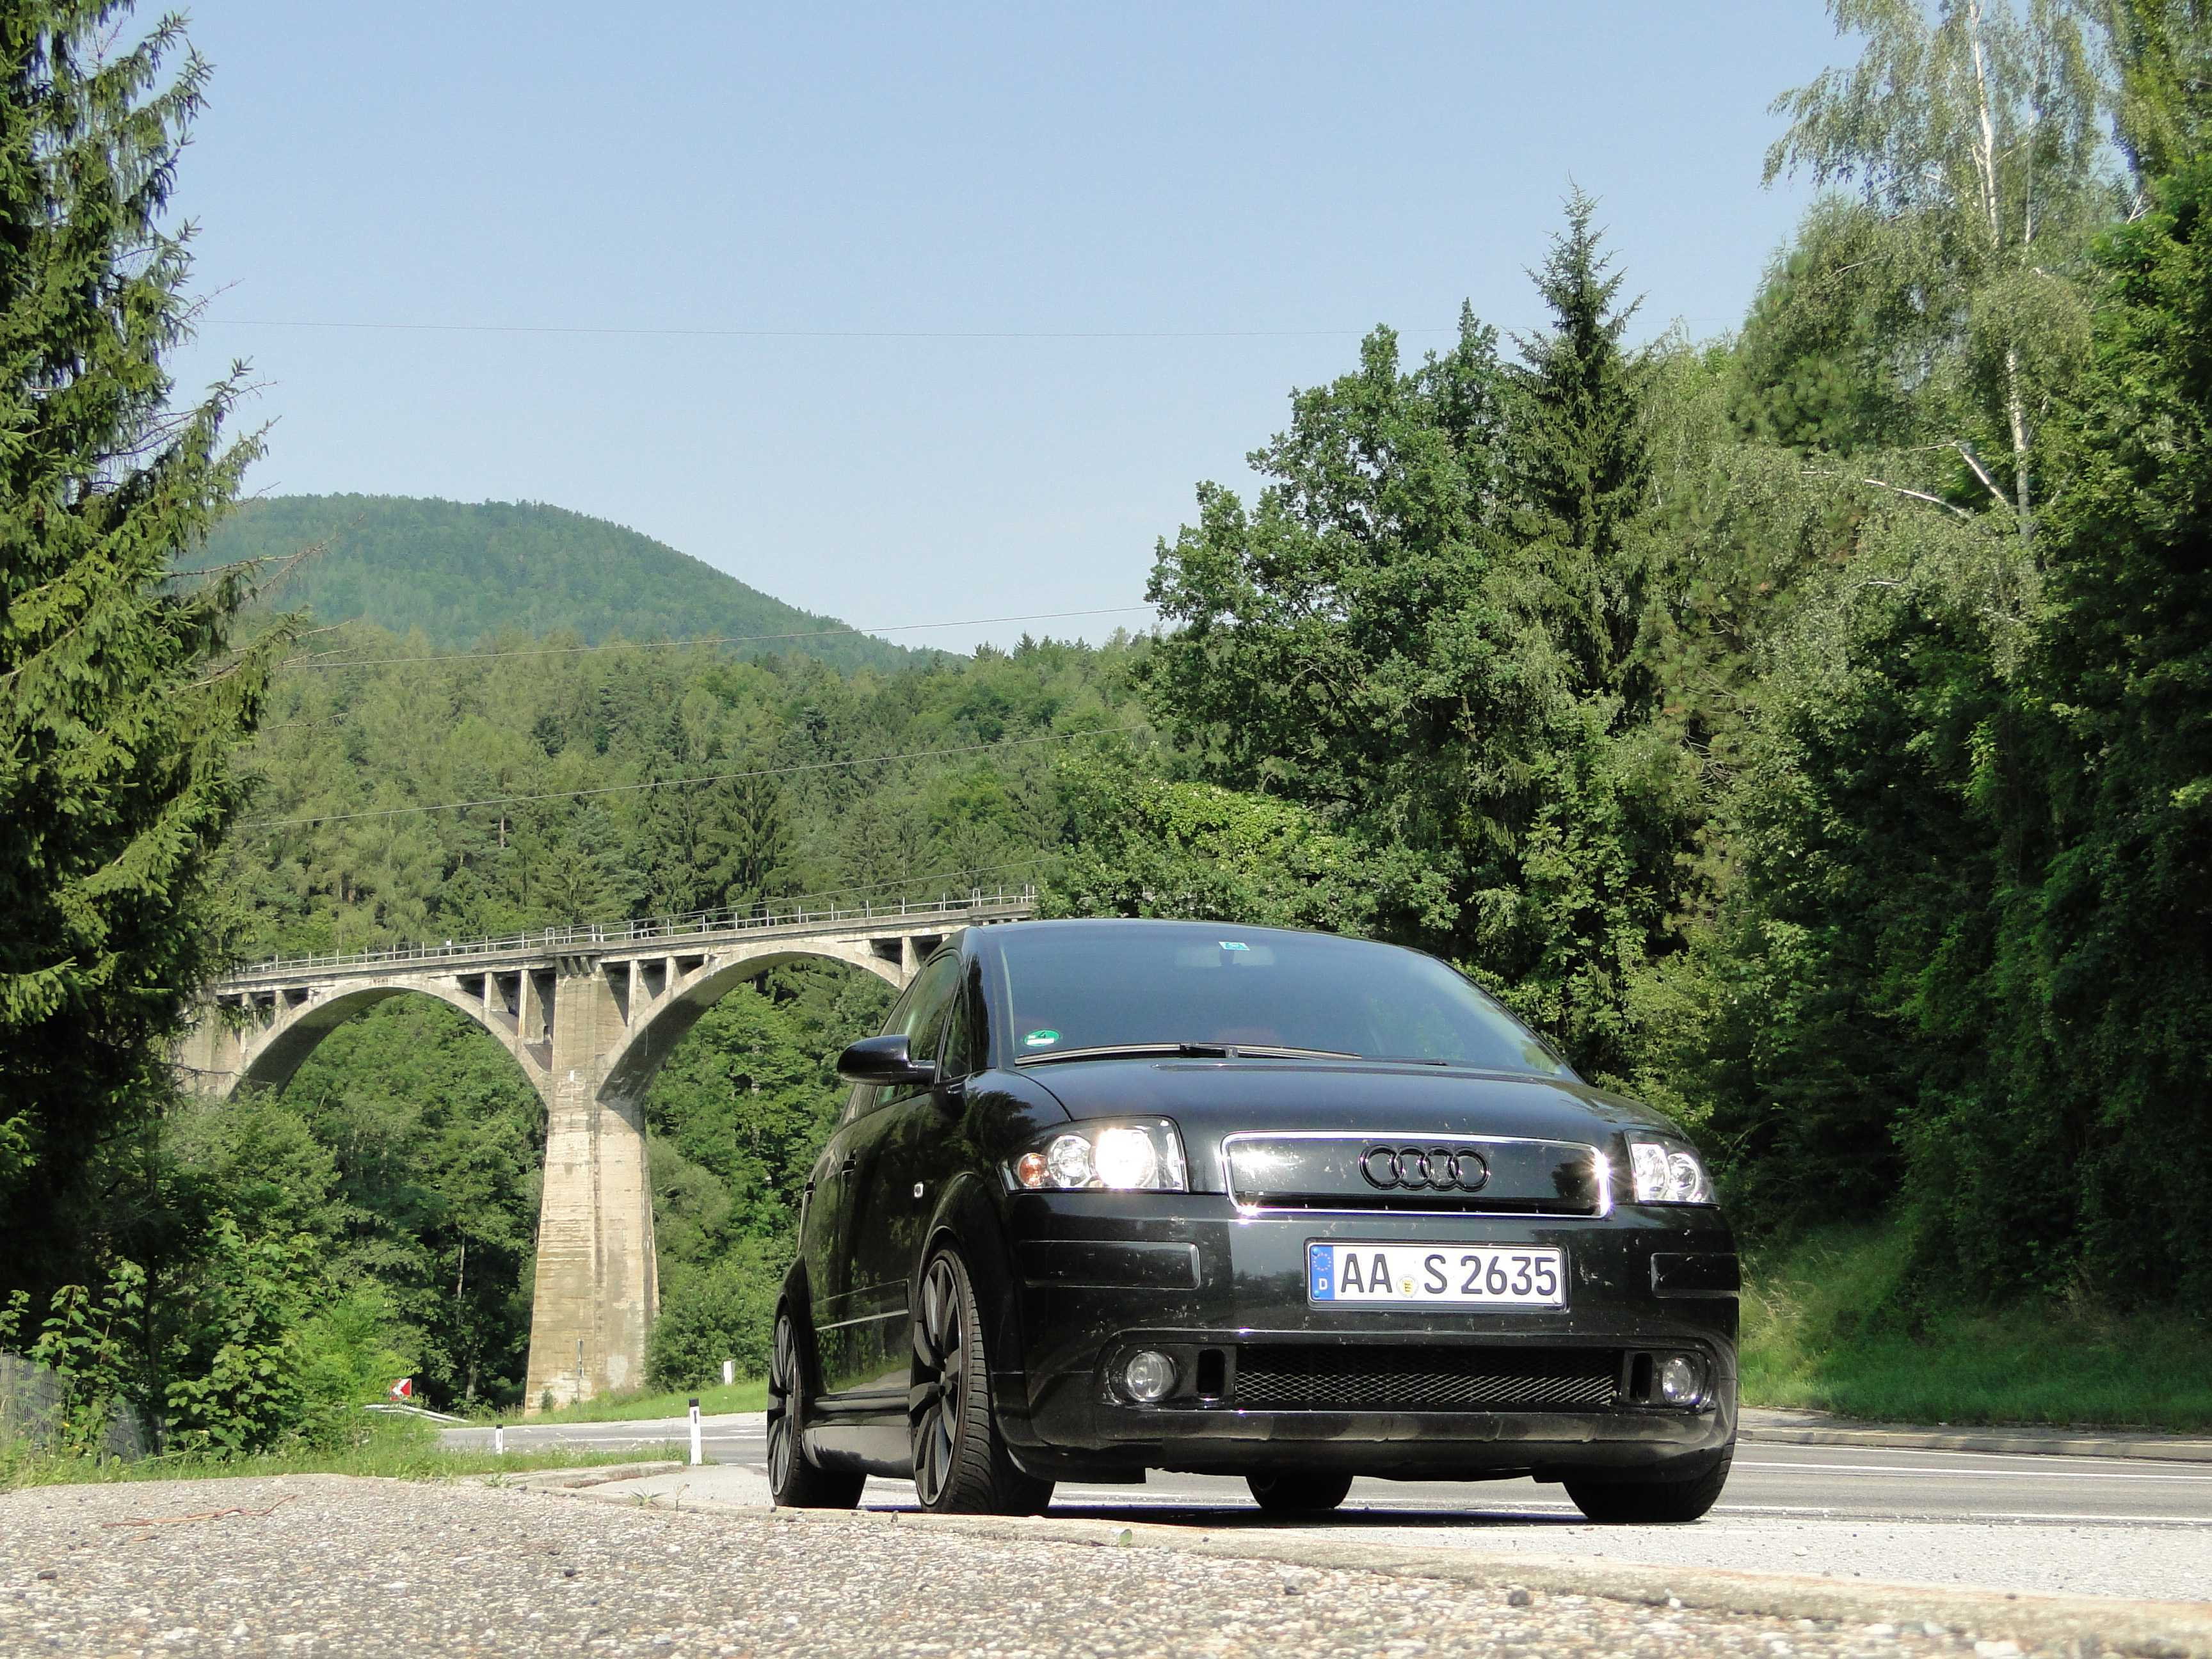 Brückenbild Istvan